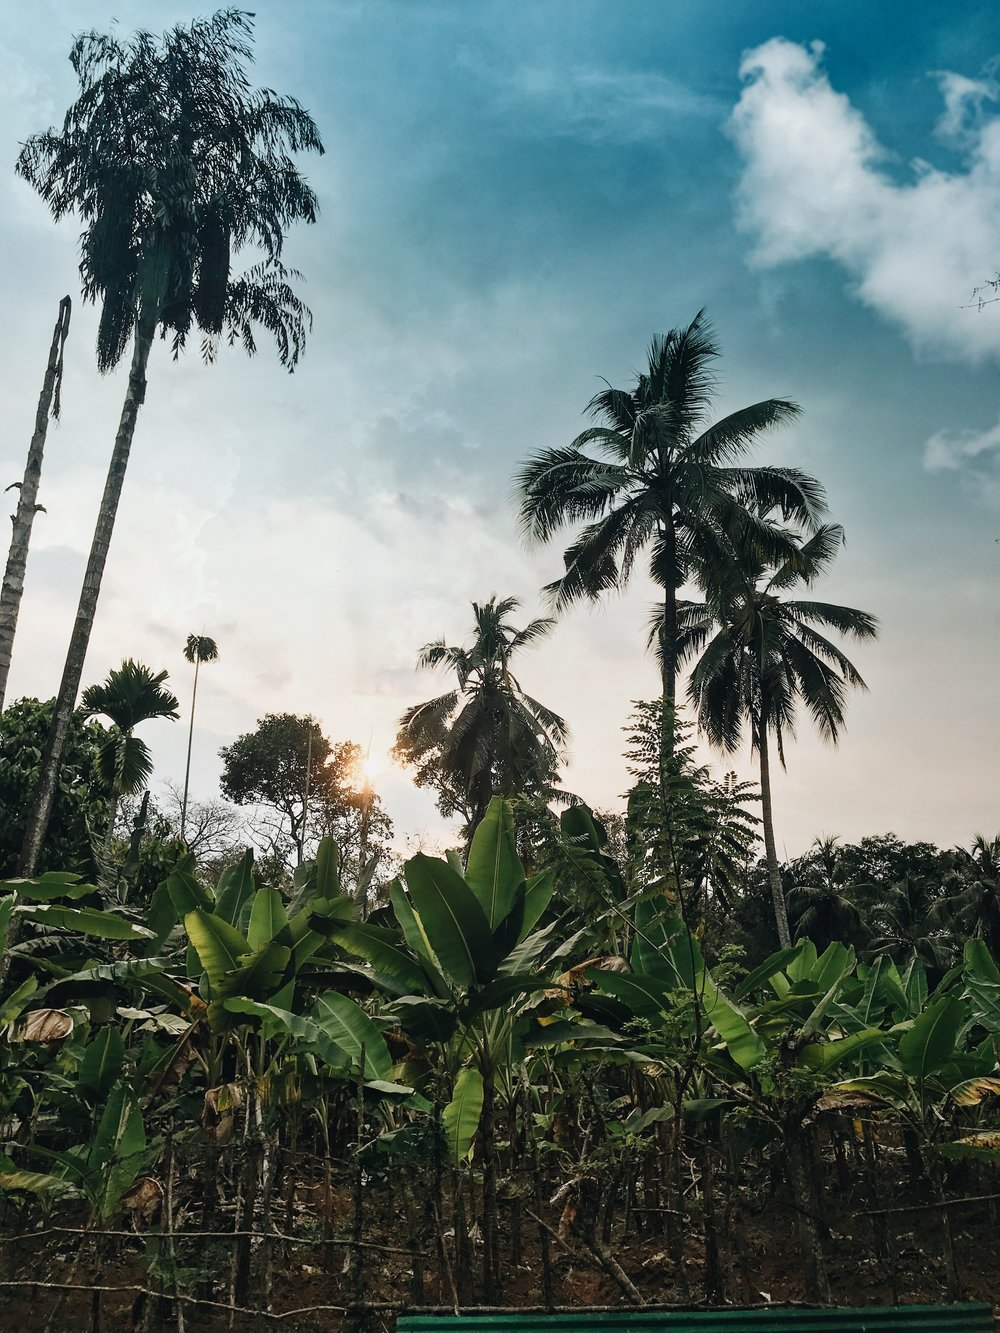 Banana plantation, Thattekad